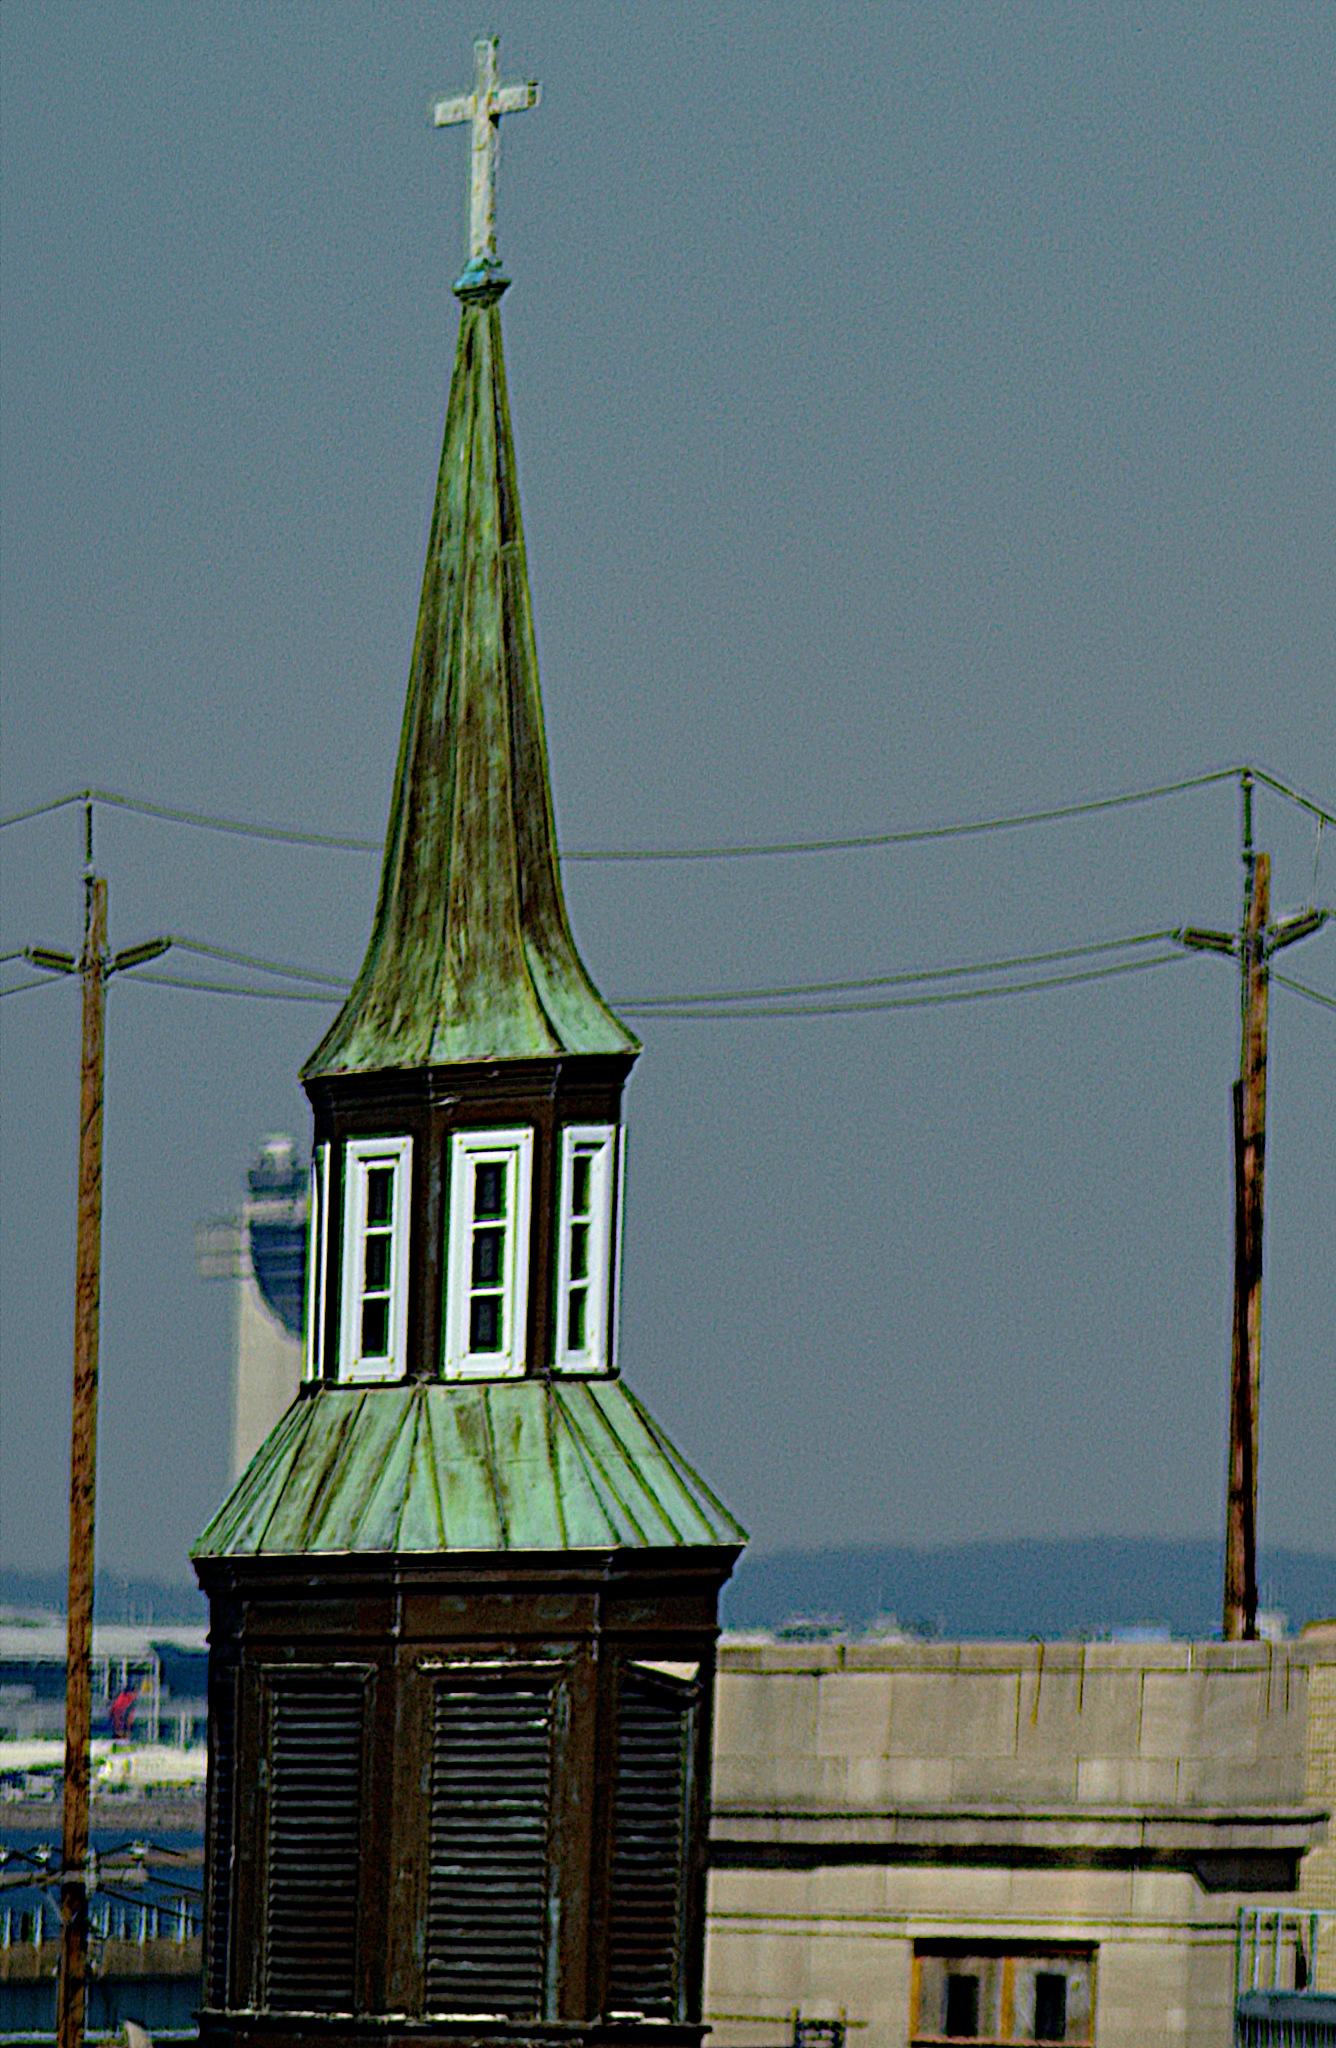 Photo in Street Photography #steeples #lightpoles #crosses #ornamental #spirituality #faith #weather beaten #wood work #nikon d5200